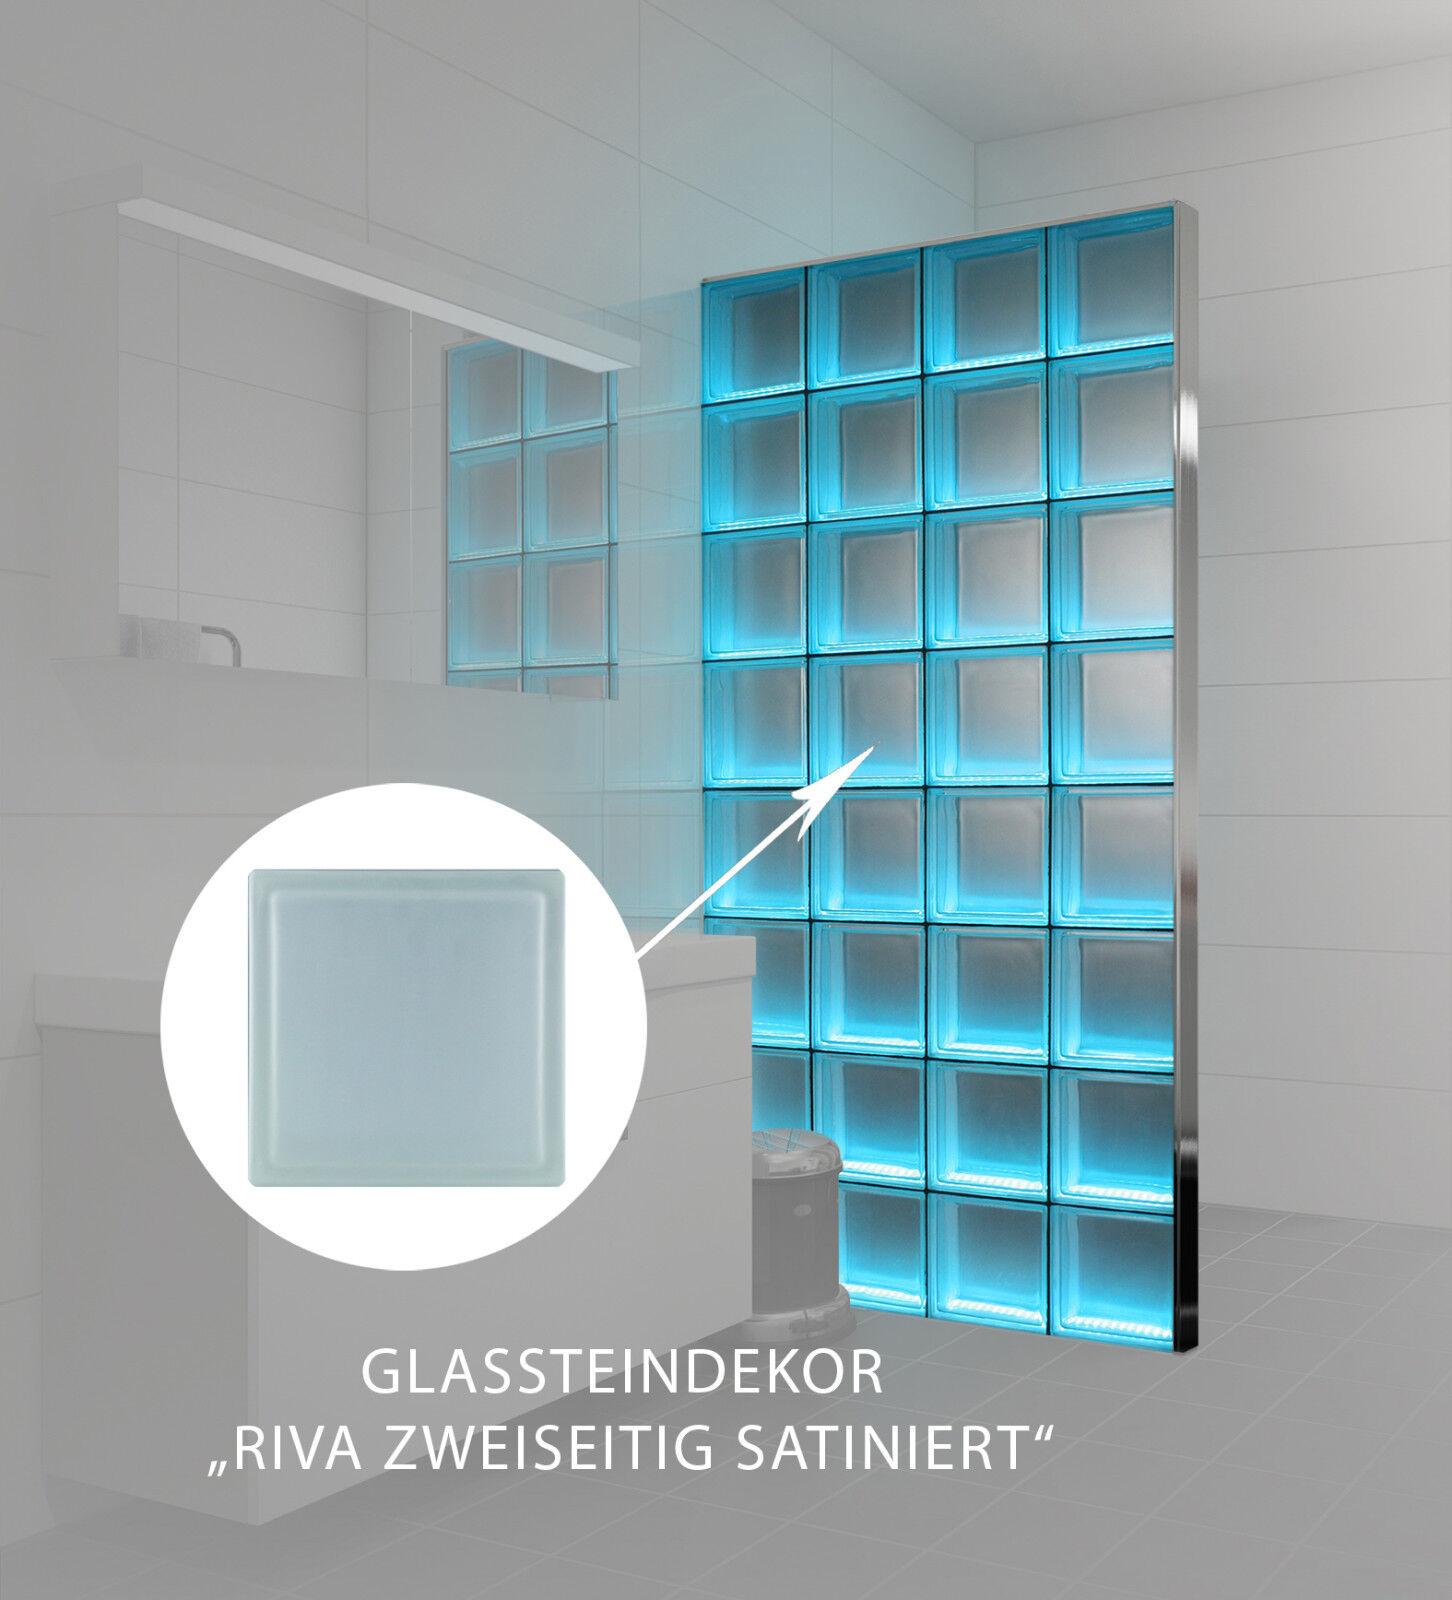 LMW Light My Wall beleuchtete Glassteinwand Riva 2-seitig satiniert 24x24x8 cm